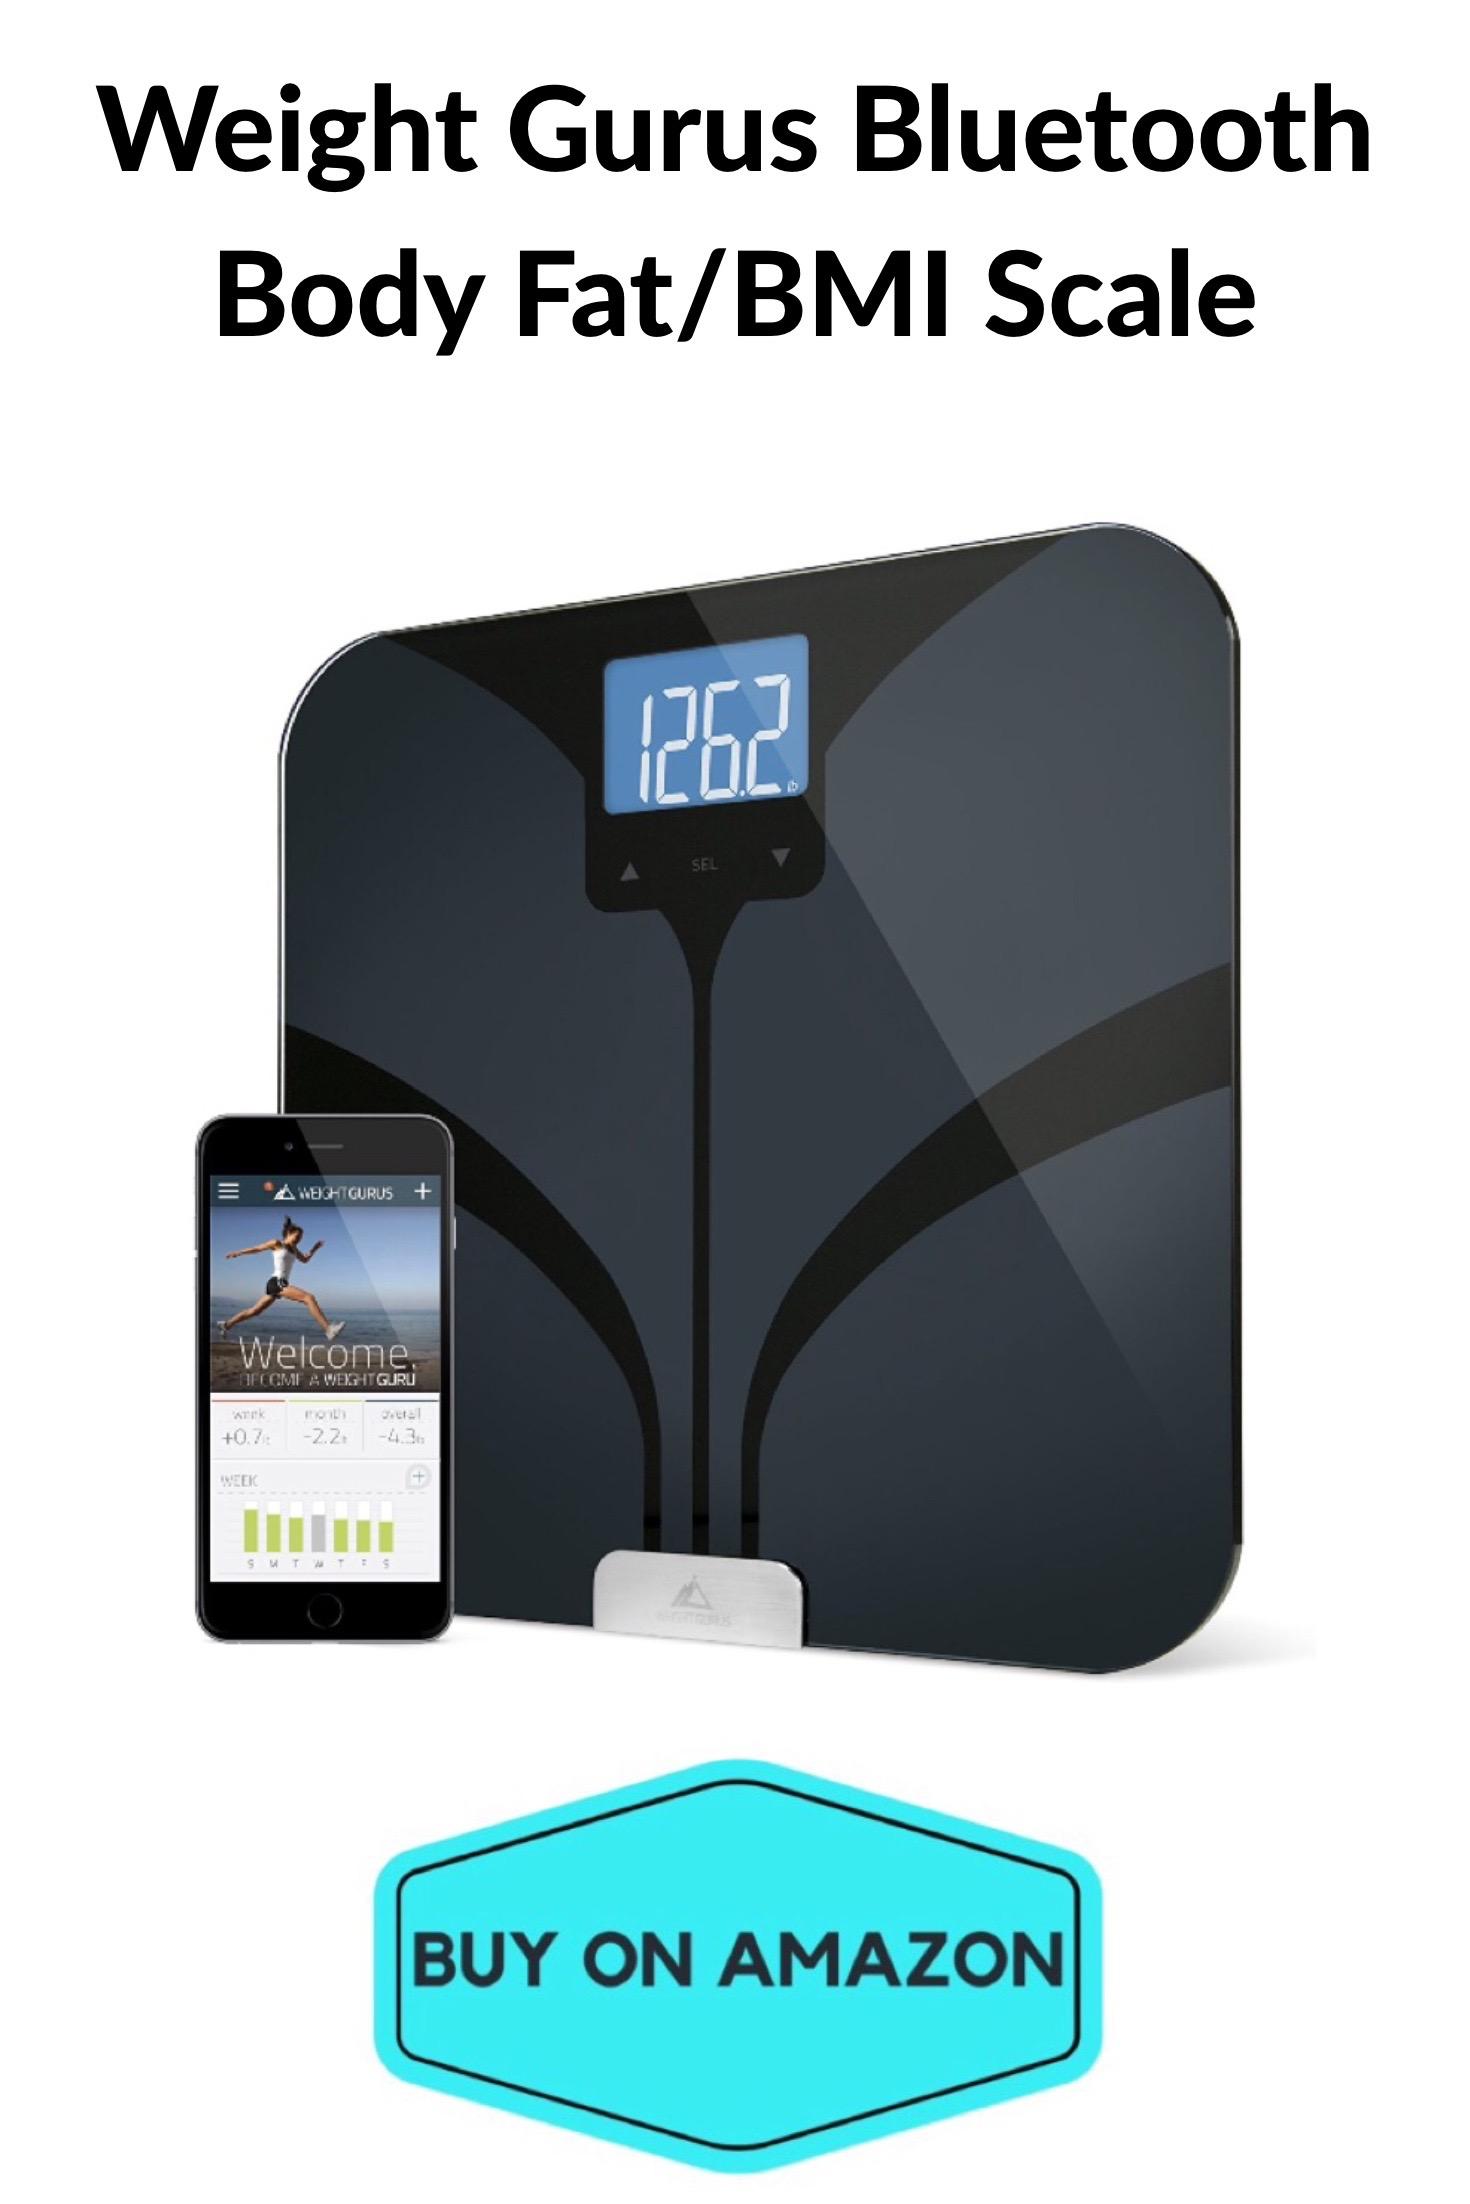 Weight Gurus Bluetooth Body Fat/BMI Scale